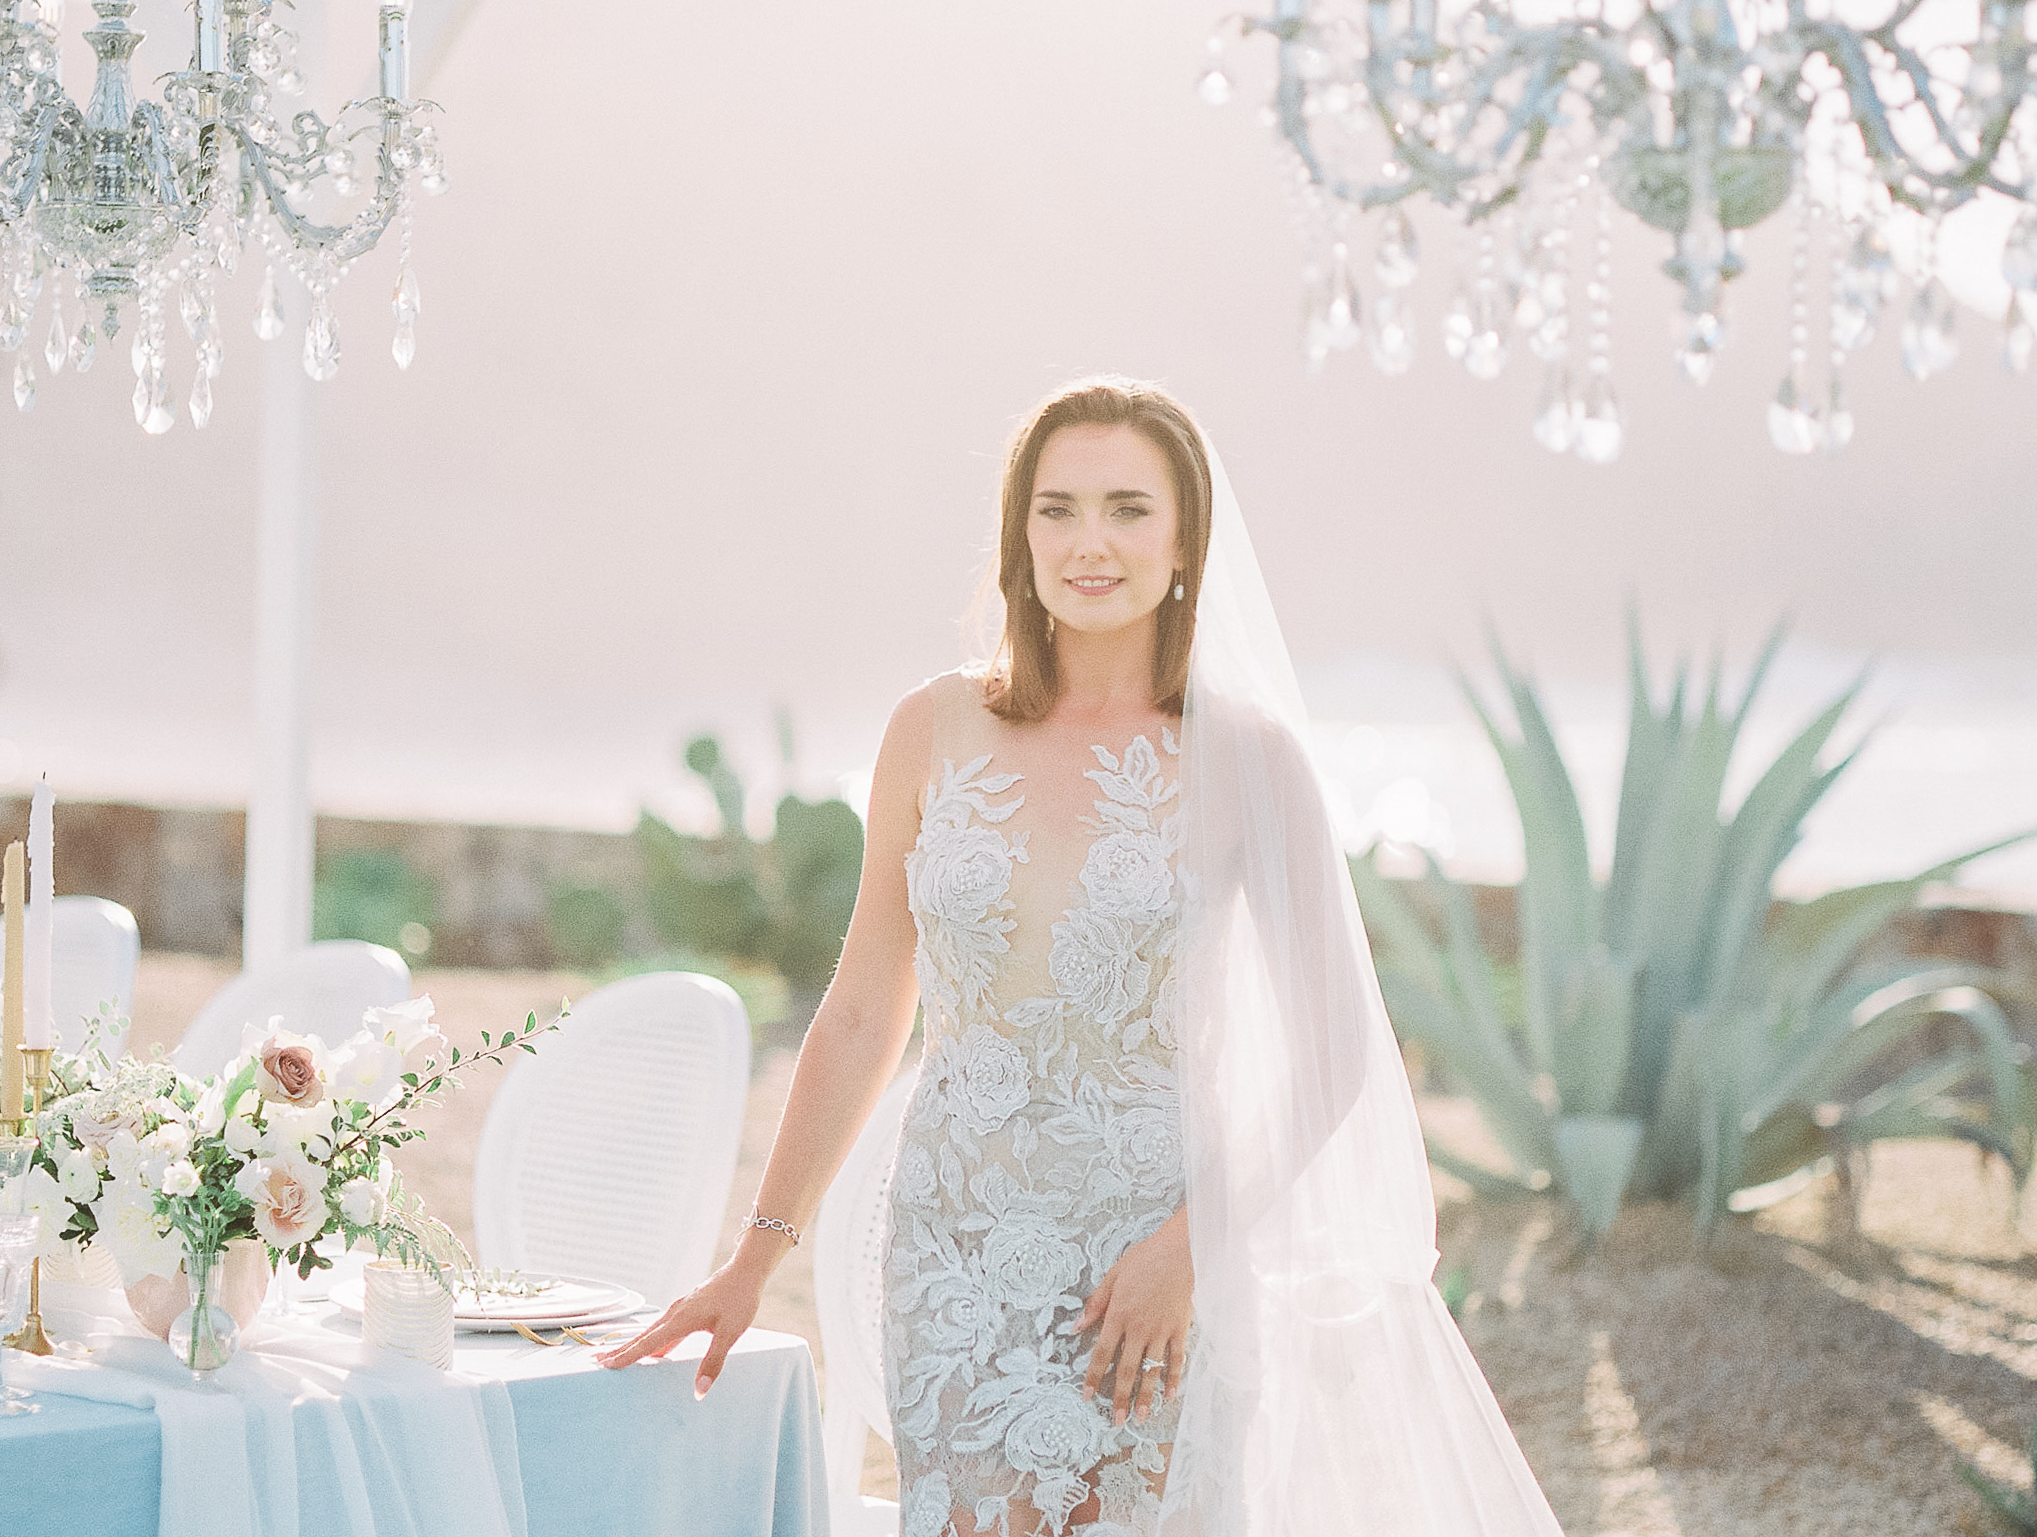 Montage-Wedding-Photos-Cabo-JBJ-Pictures-266.jpg